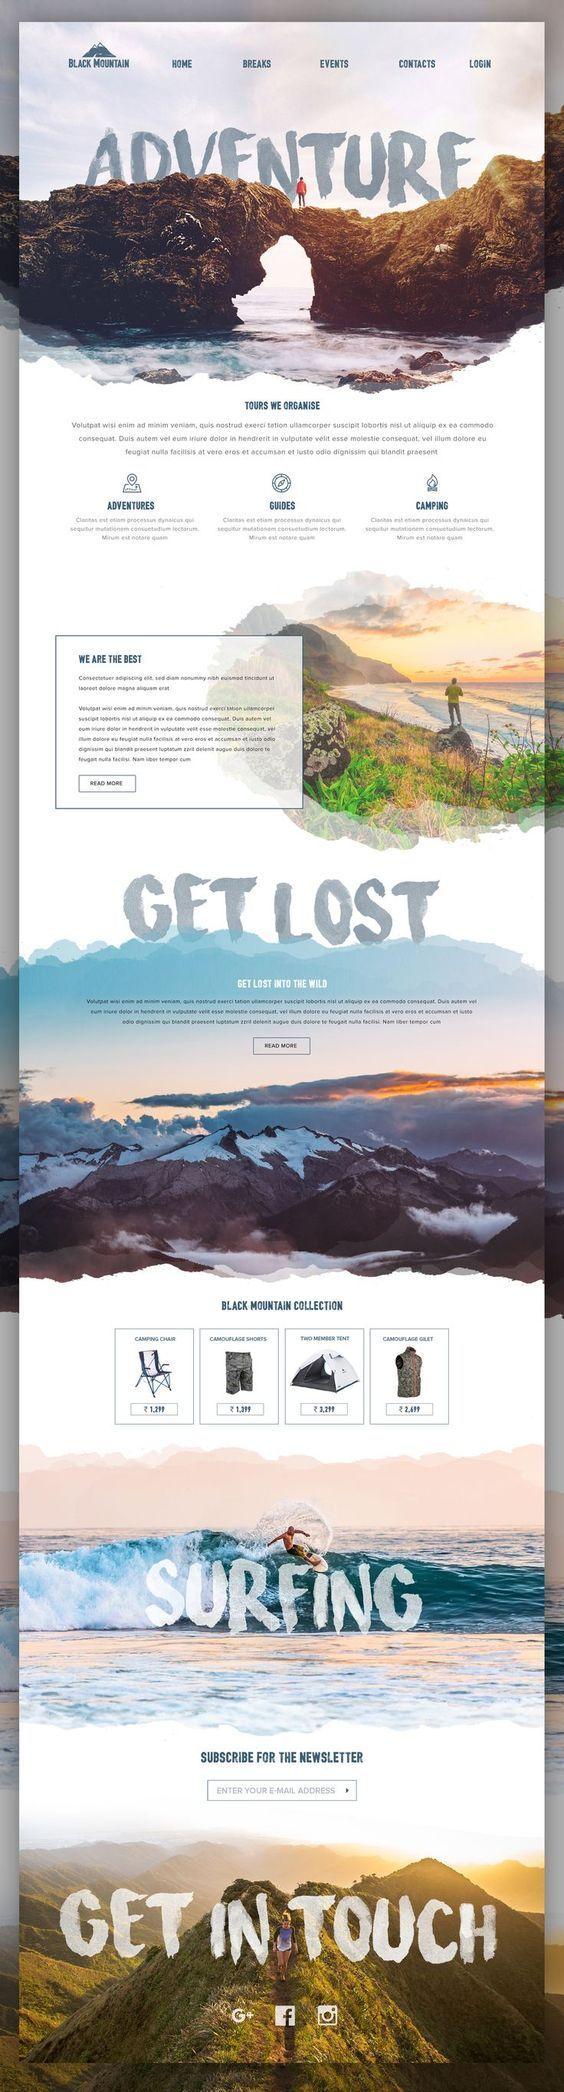 Landingpage for a adventure travel website   Web design   Pinterest – Francisco Ceruti